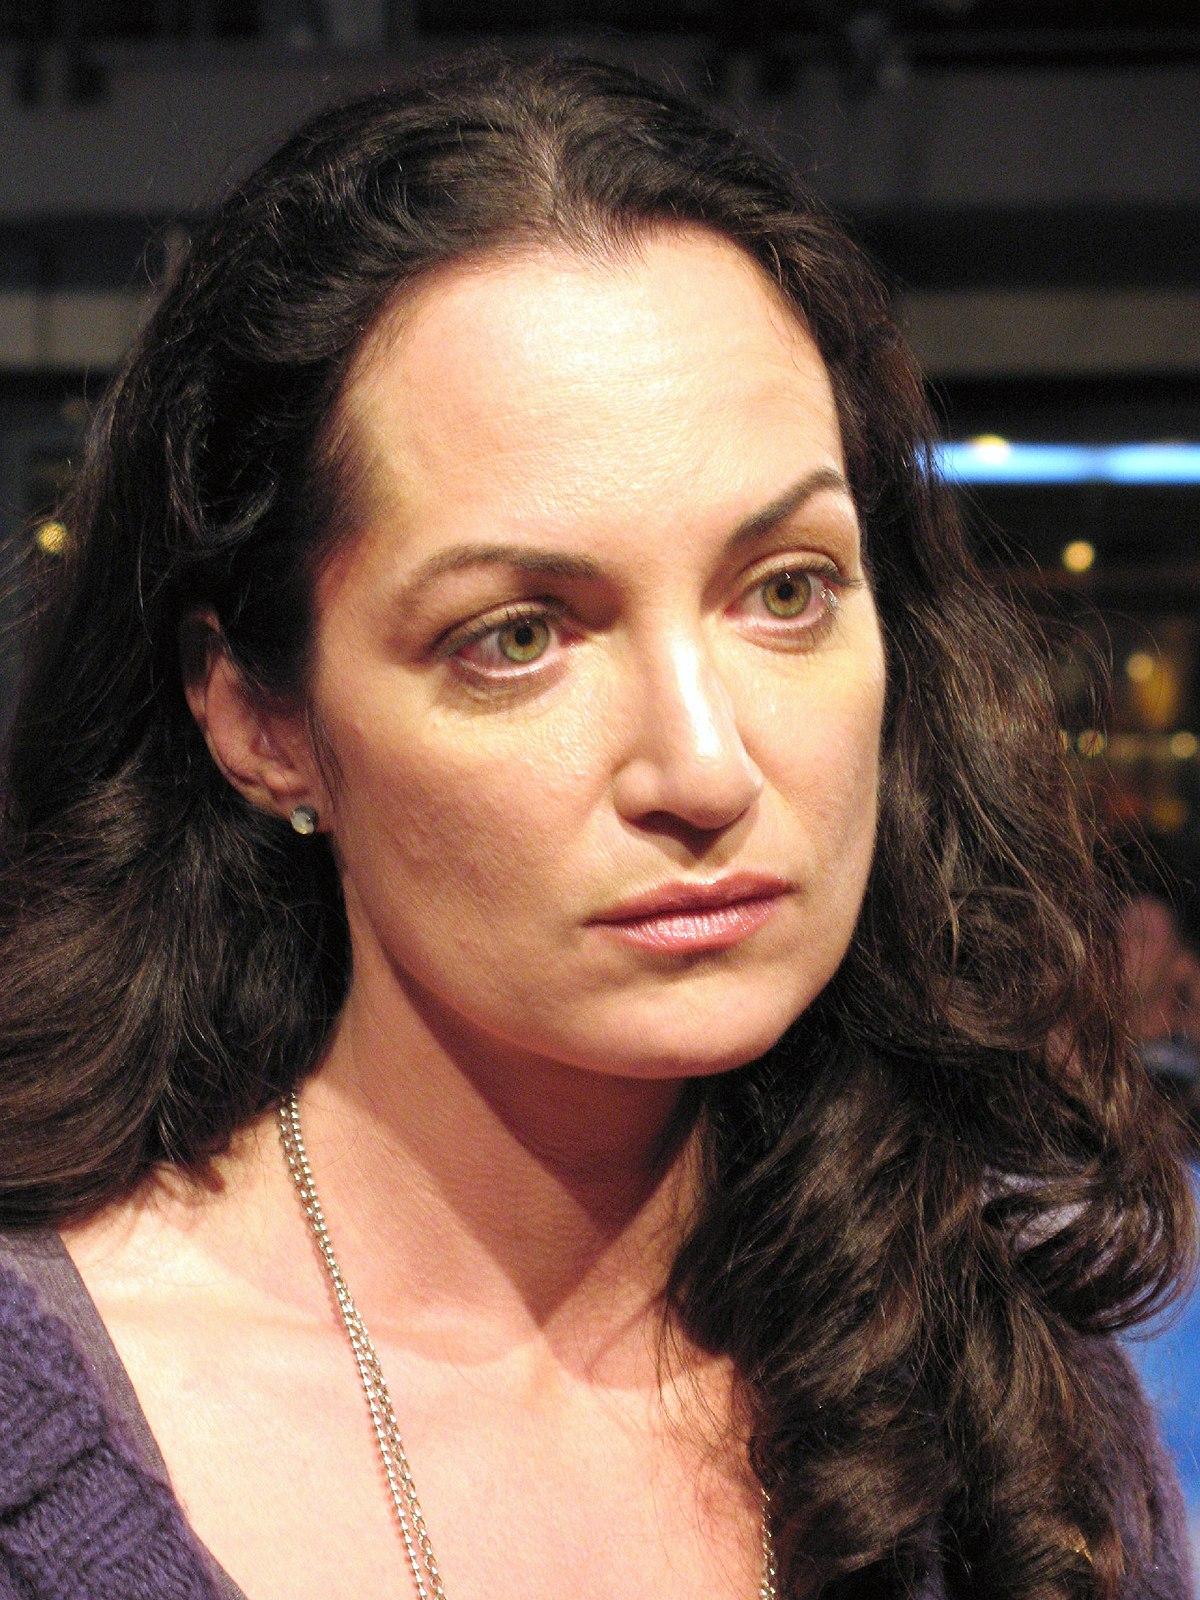 Natalia Wörner Nackt